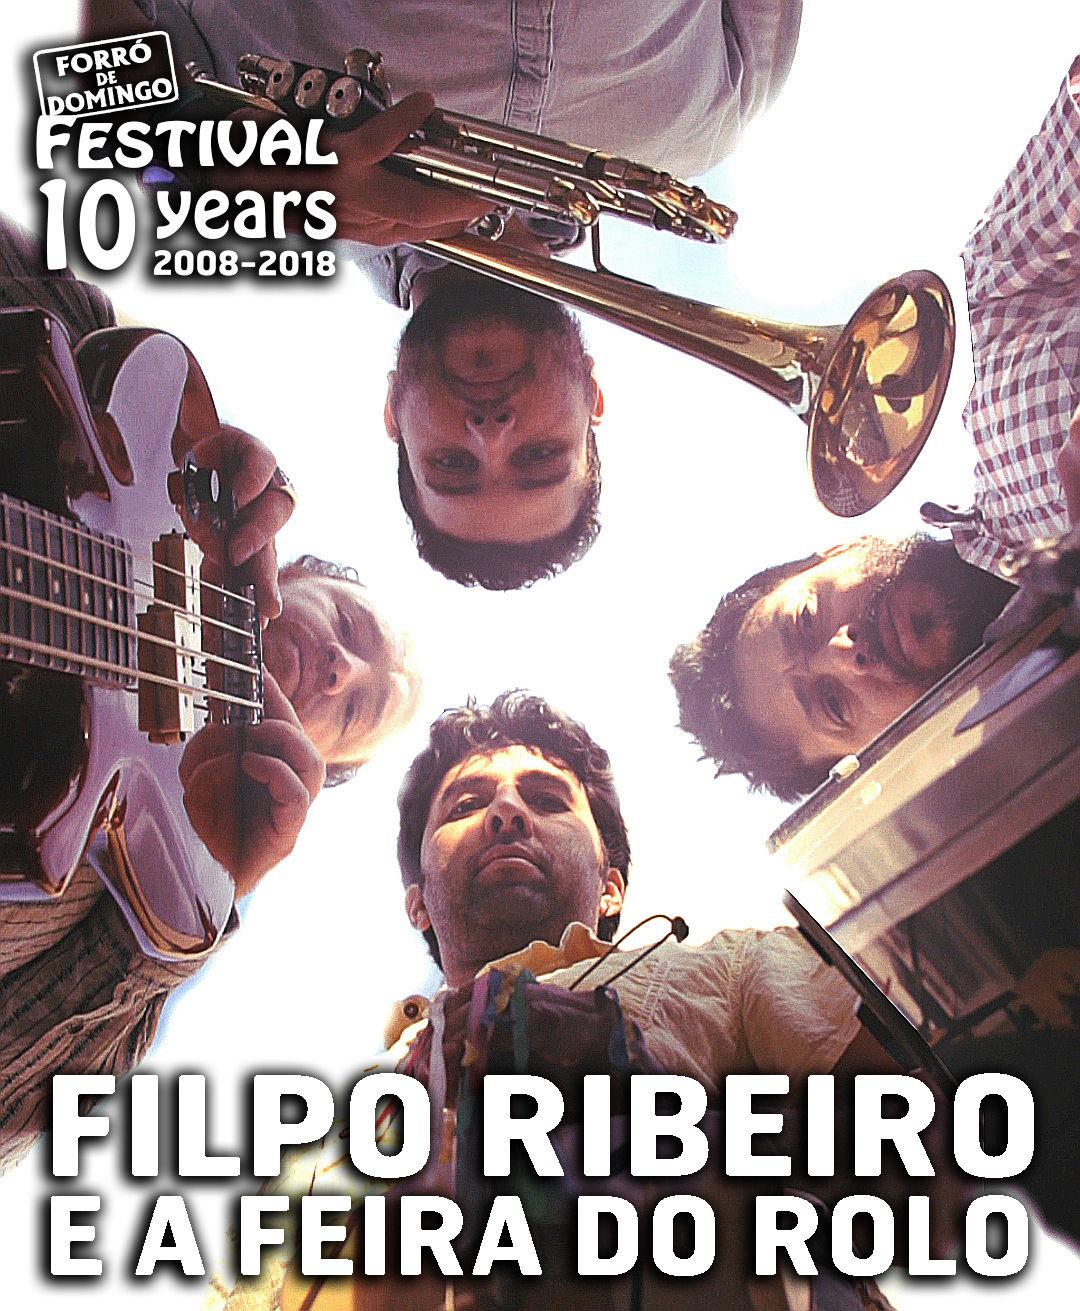 https://forrofestival.com/wp-content/uploads/2018/03/FILPO-E-A-BANDA_forro-de-domingo-festival-2018_1.jpg